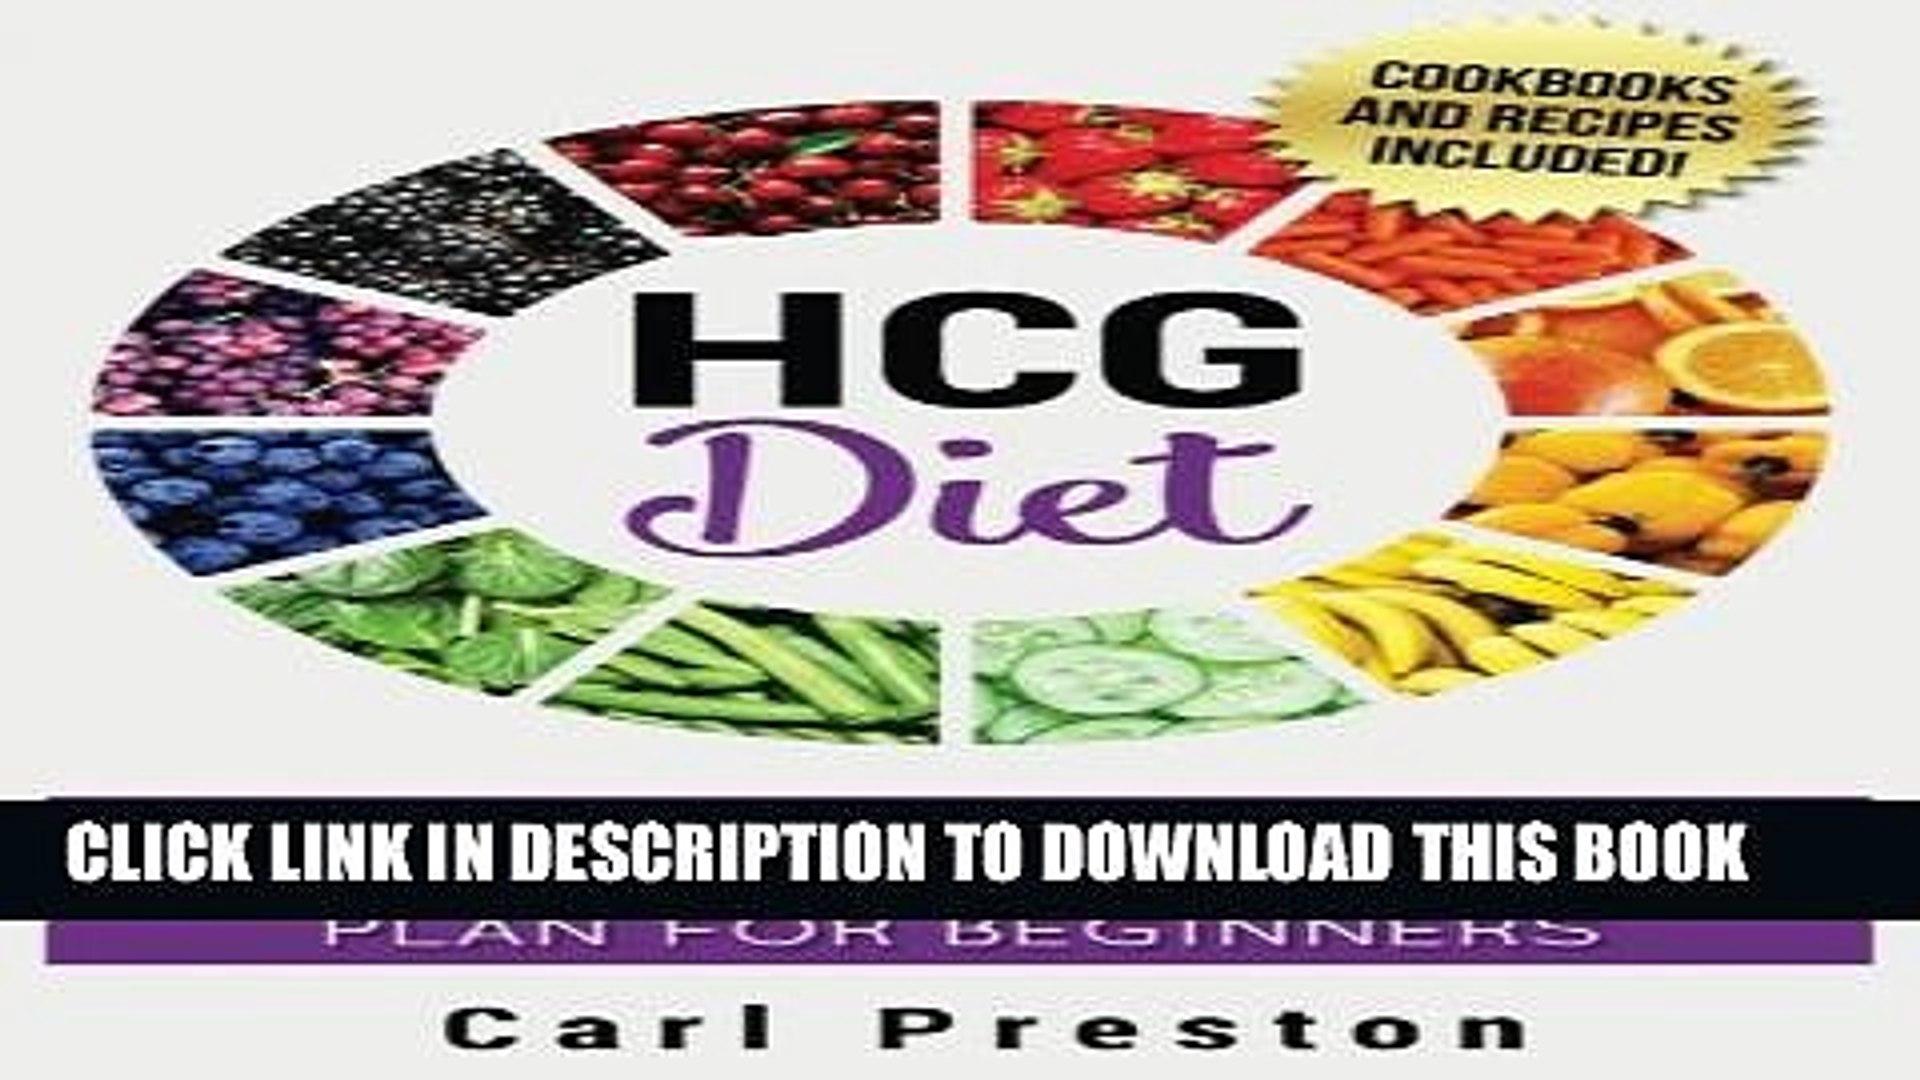 [PDF] HCG Diet: HCG Diet Plan: HCG Diet Cookbook with 50 + HCG Diet Recipes and Videos - HCG Diet